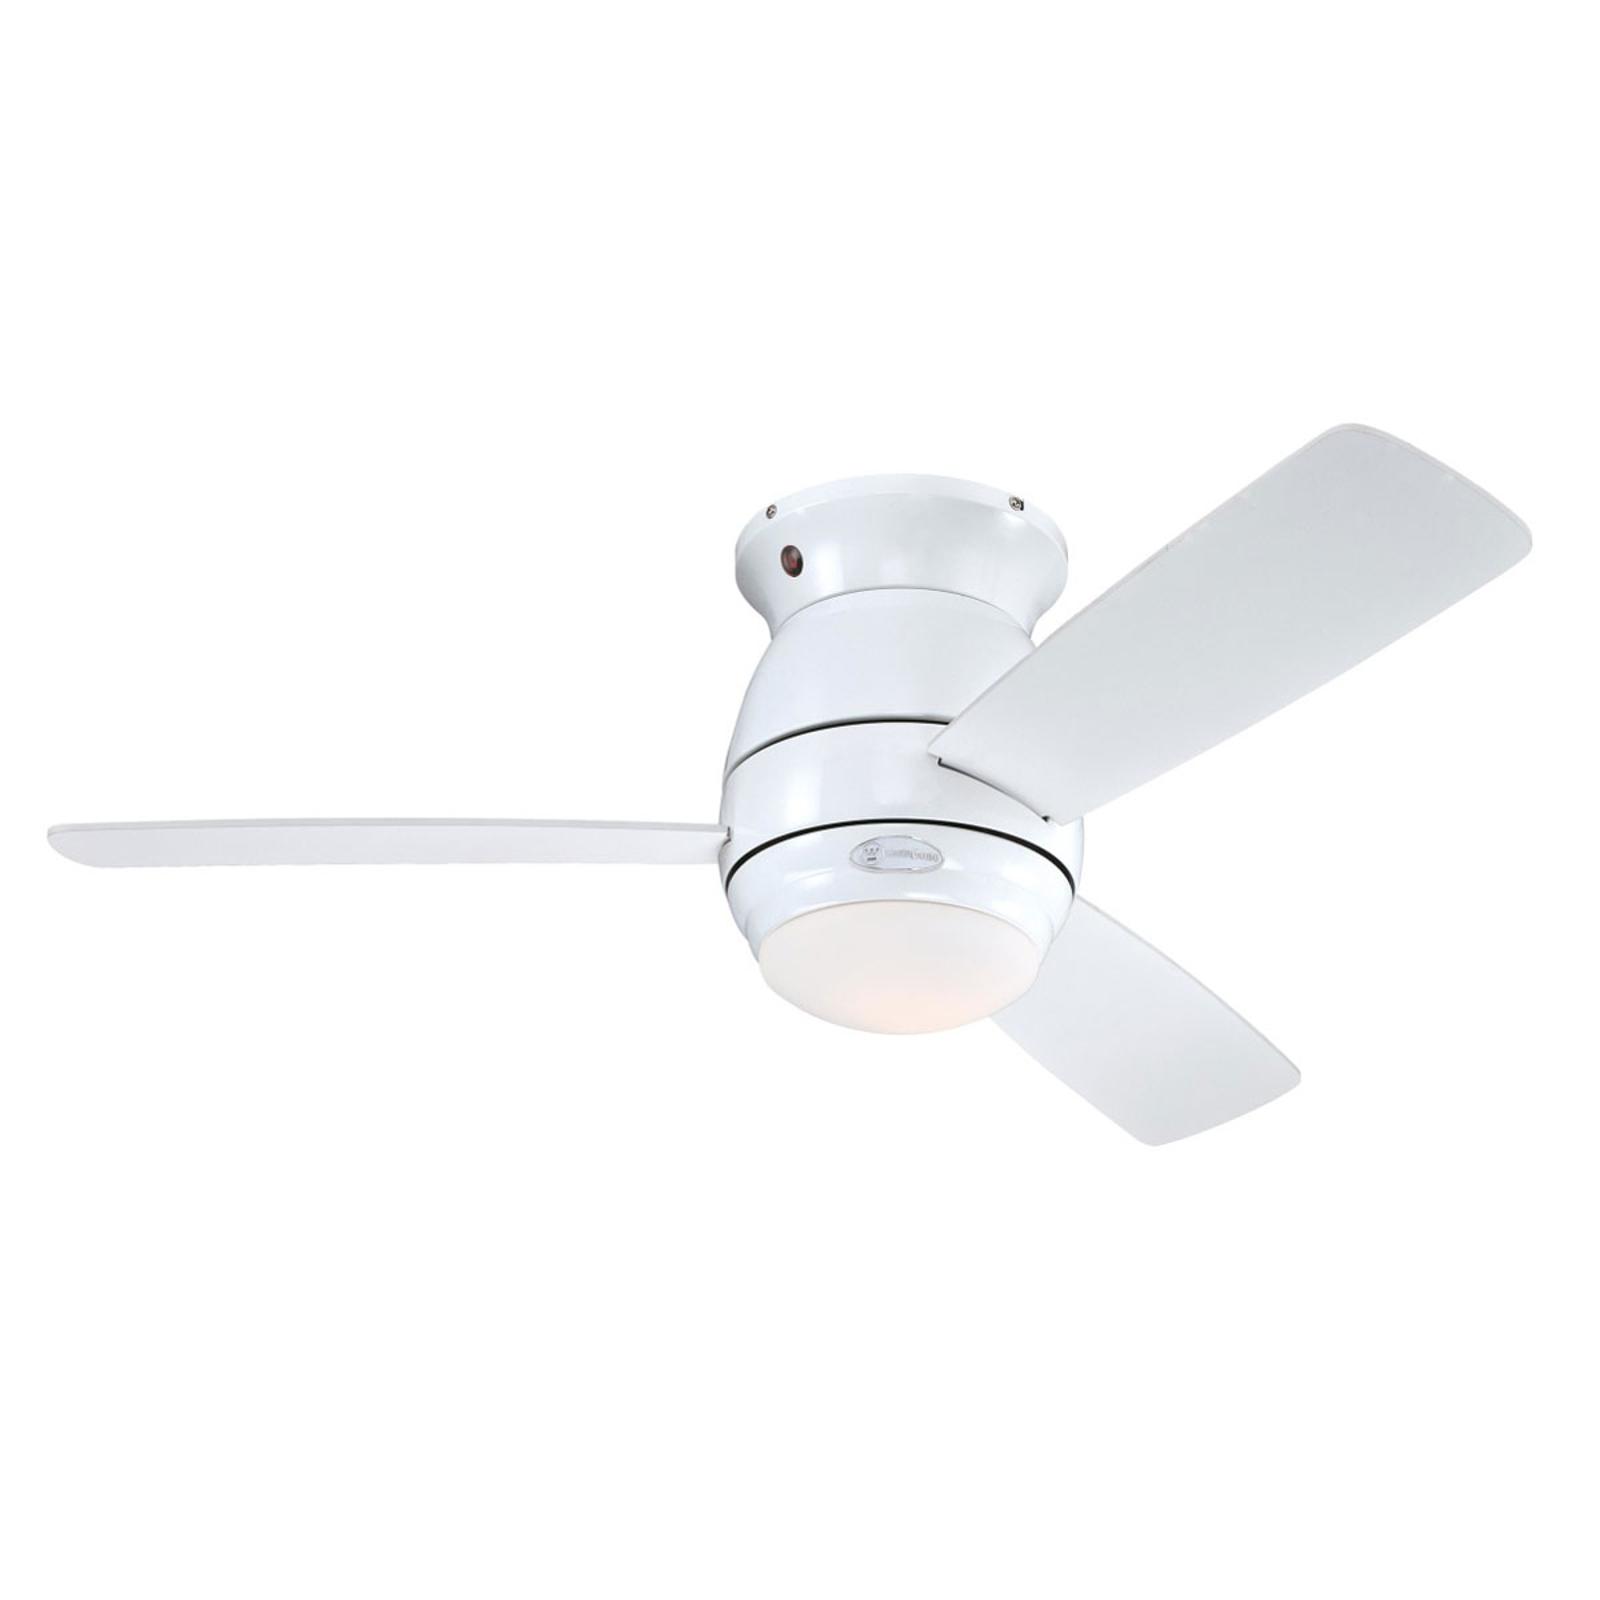 Westinghouse Halley Ventilator Flügel weiß/ahorn